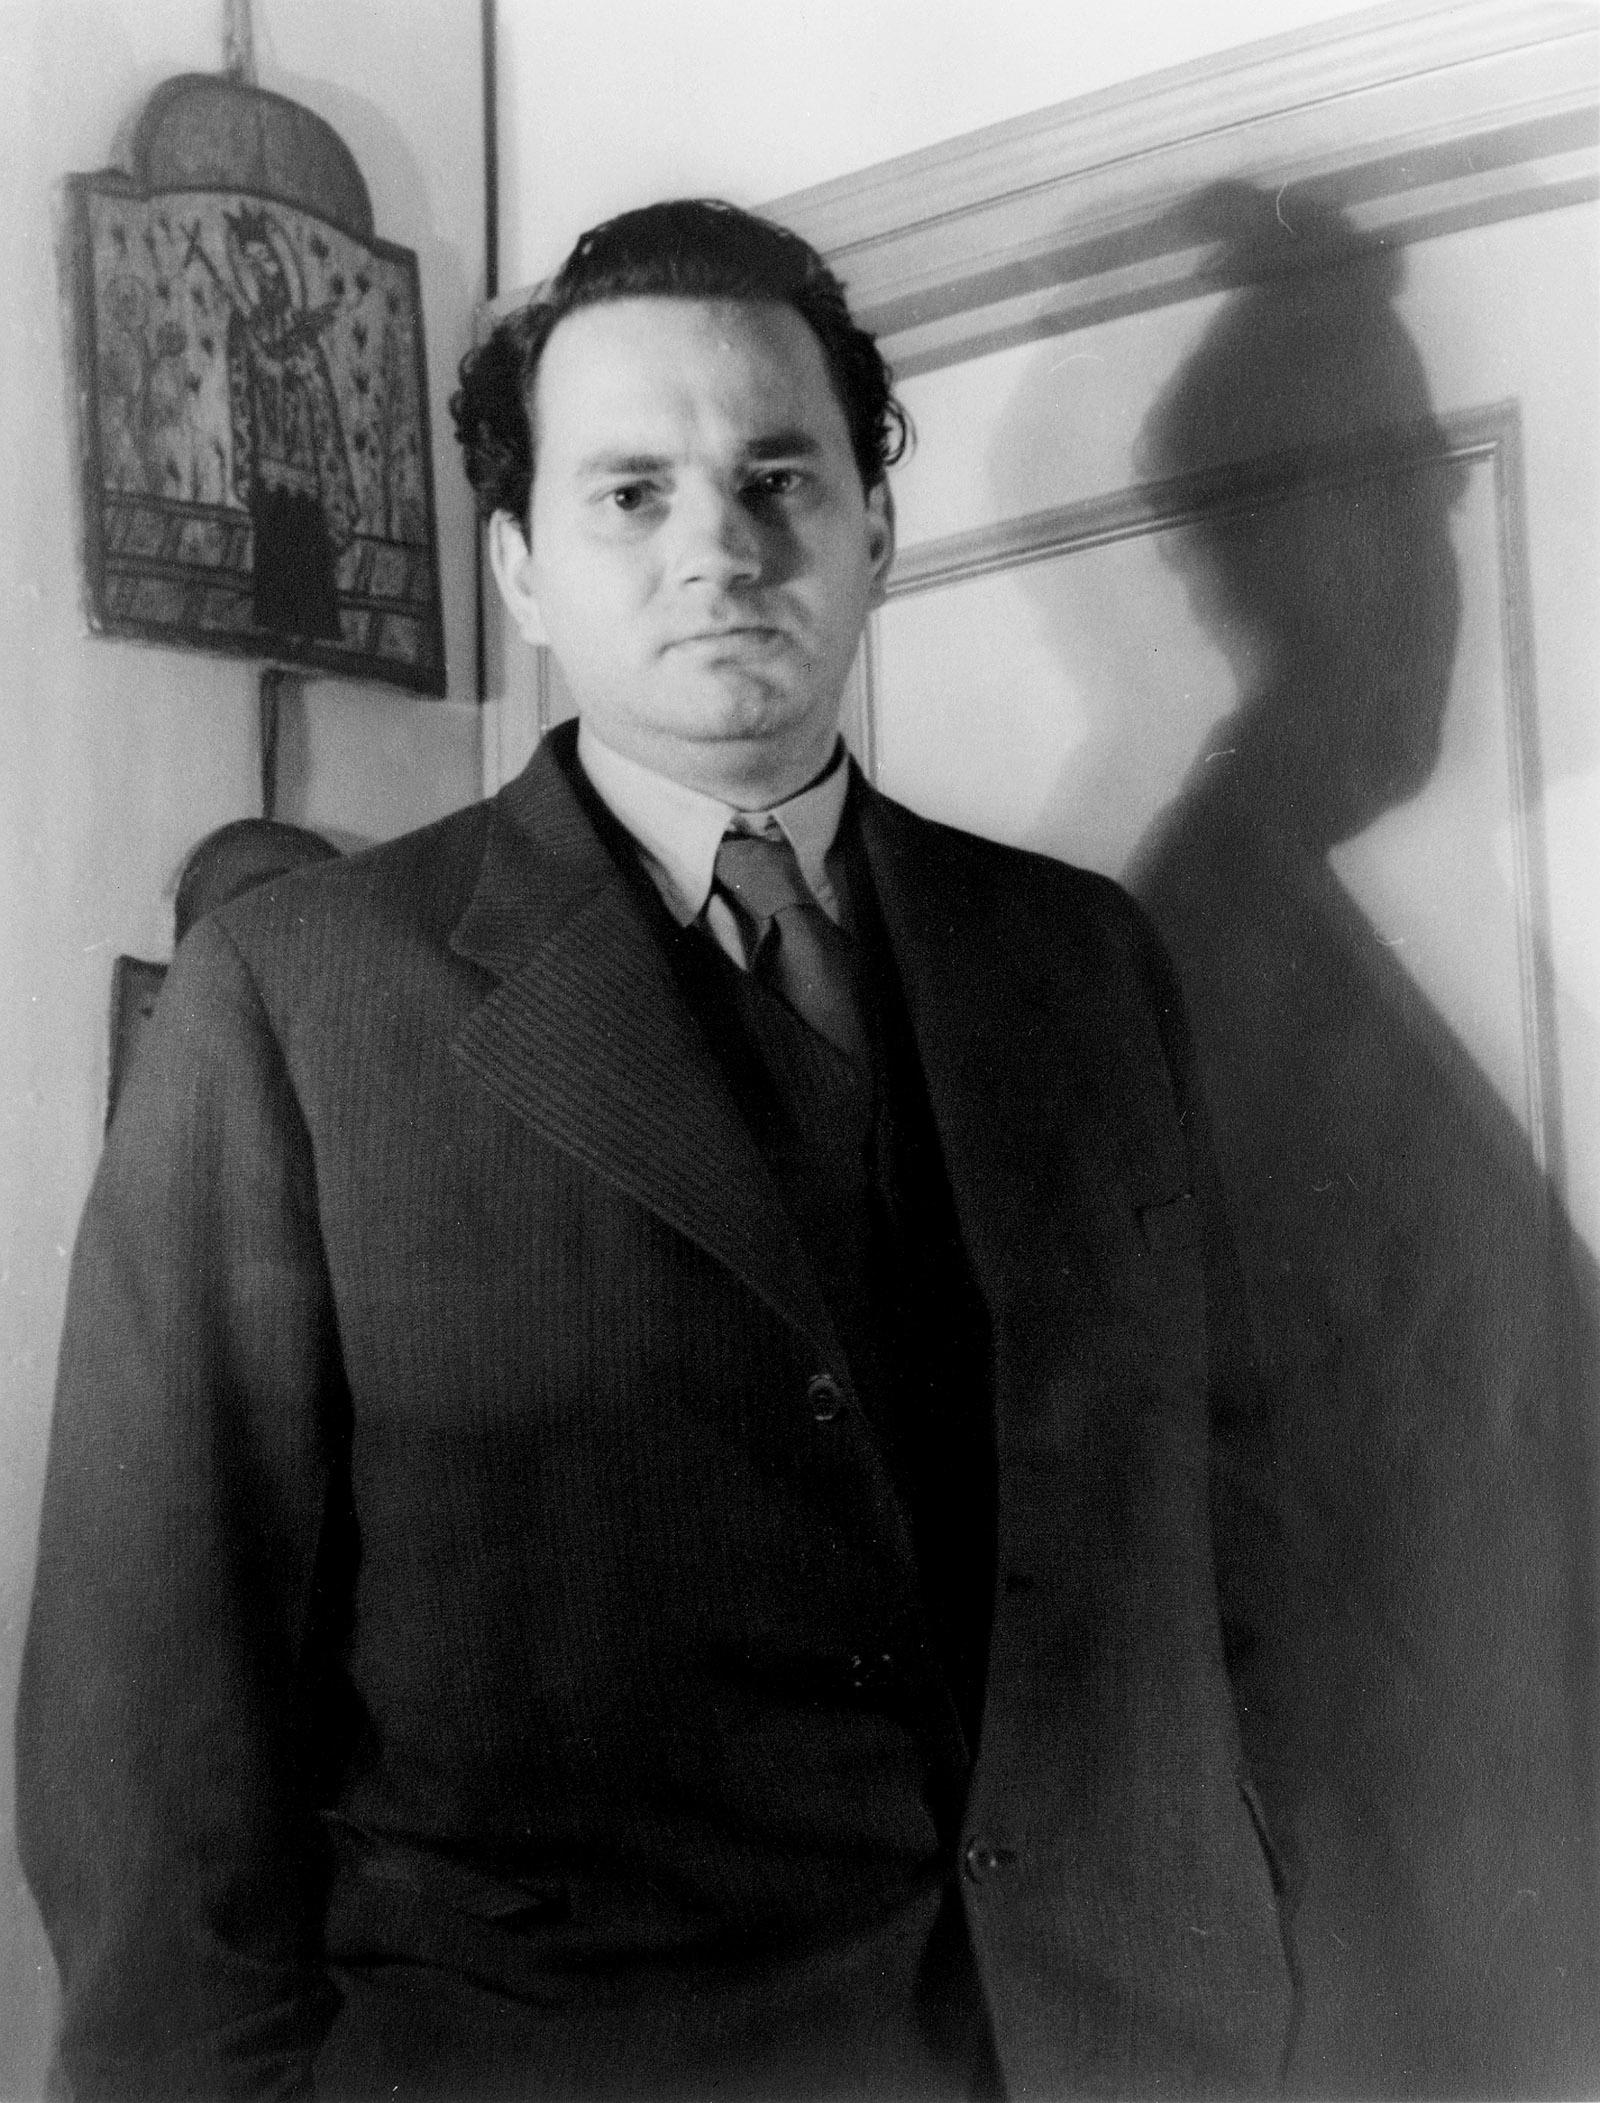 Thomas Wolfe, April 1937; photograph by Carl Van Vechten